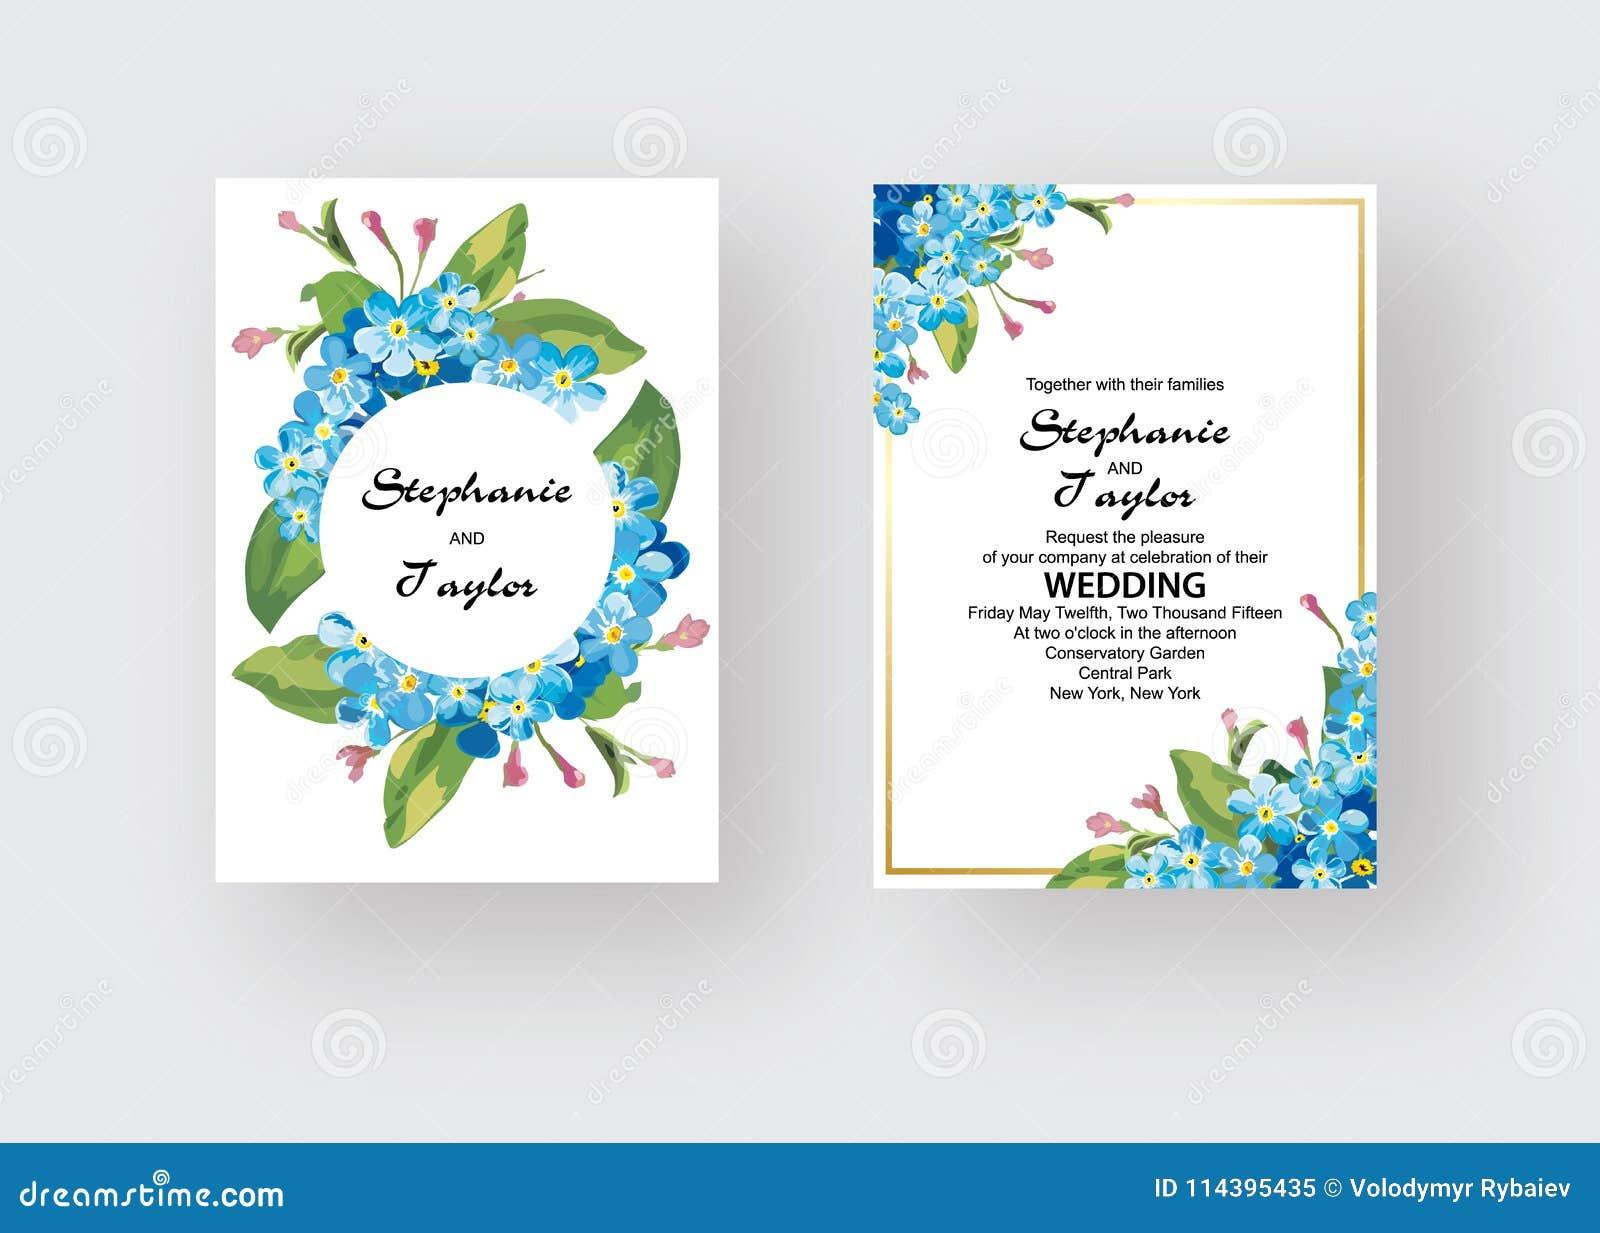 Wedding Invitation, floral invite thank you, rsvp modern card Design: green tropical palm leaf greenery eucalyptus